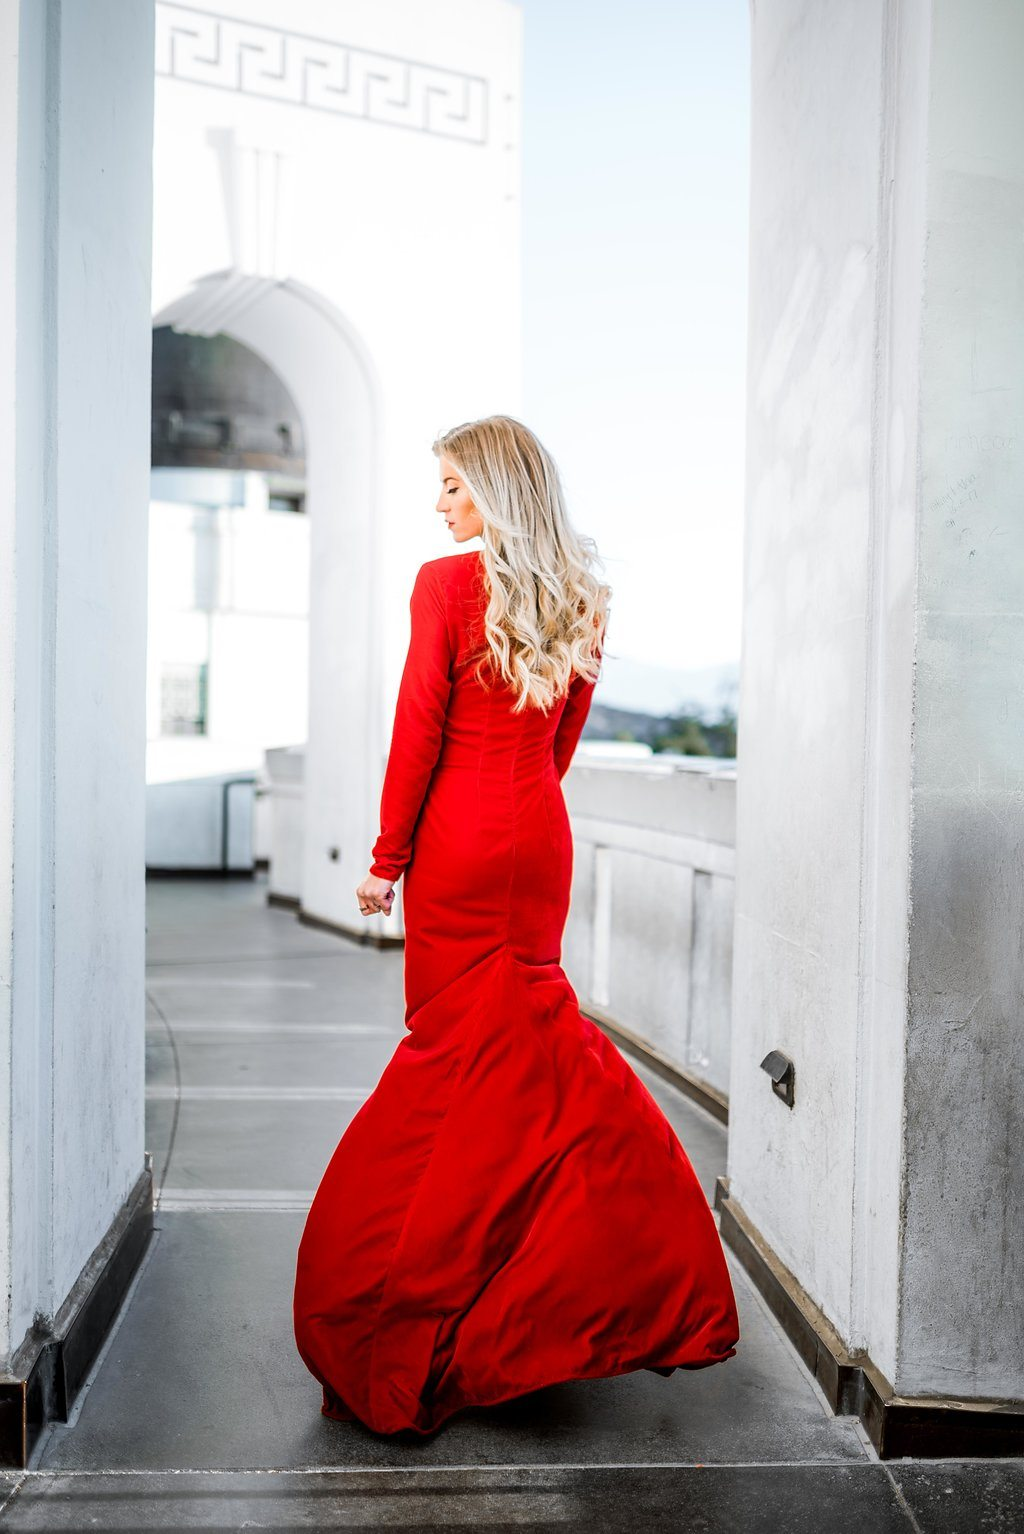 The December Dress